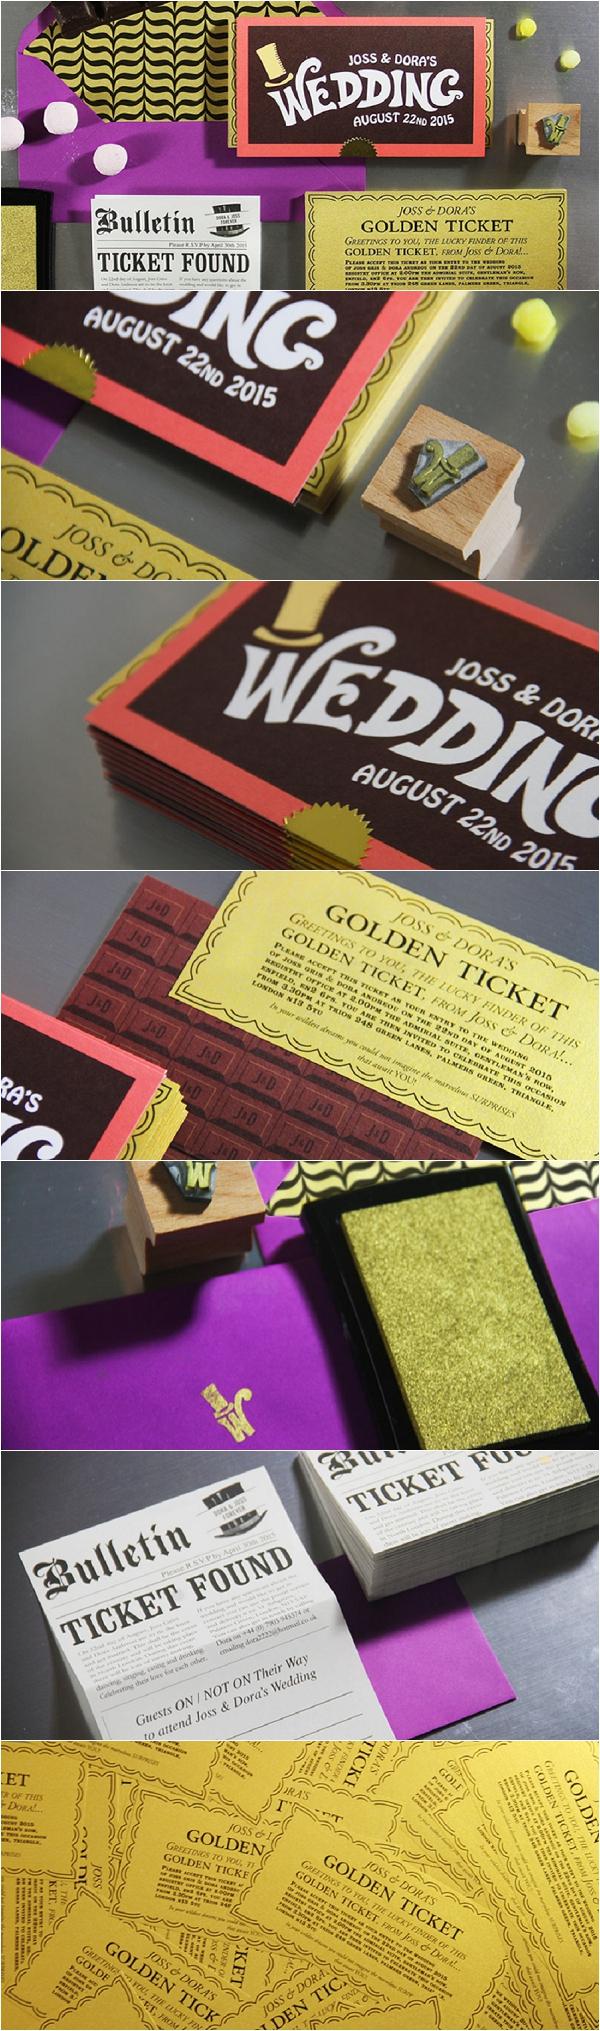 Wonka Wedding Stationery by Creative Wedding Stationery company Belleink